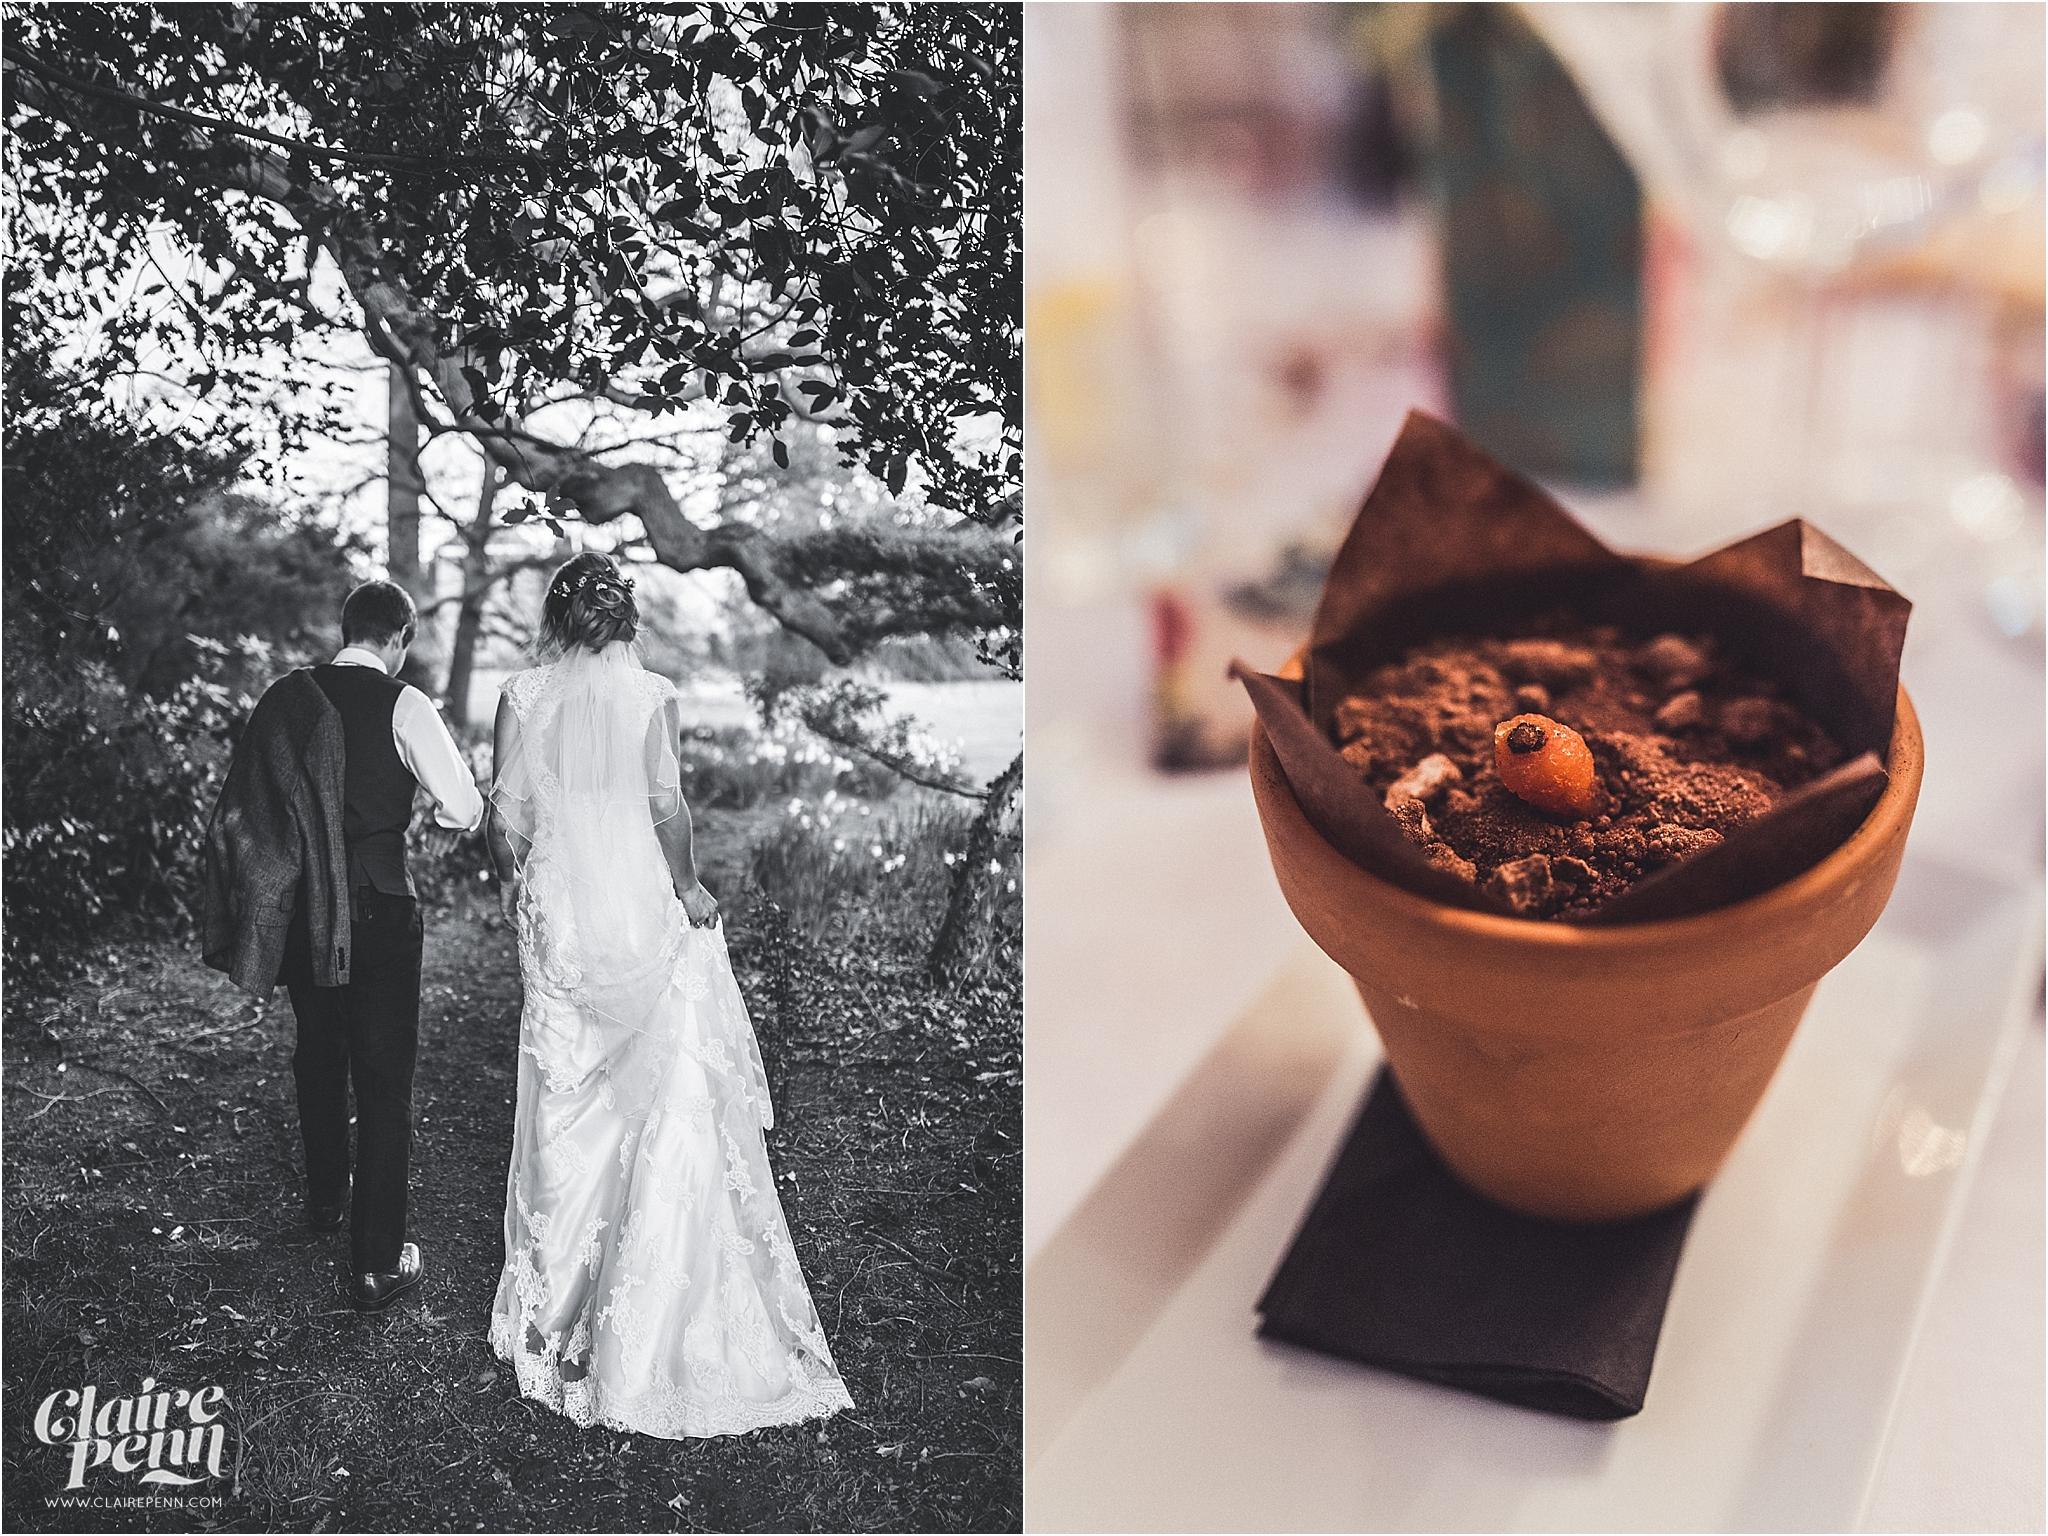 Iscoyd Park wedding, Whitchurch, Cheshire wedding photographer_0054.jpg